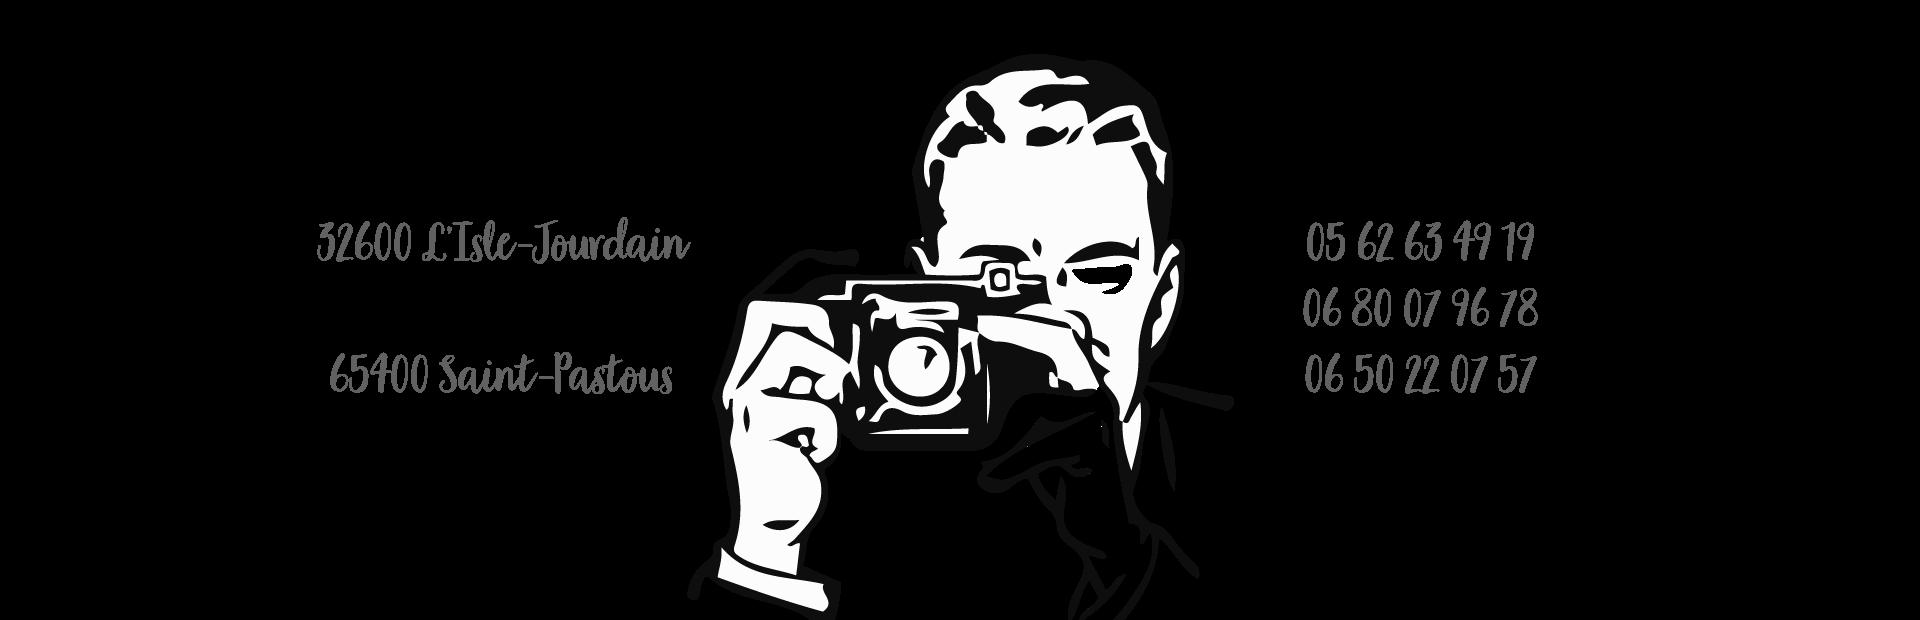 AD PHOTOGRAPHIE - photographie scolaire